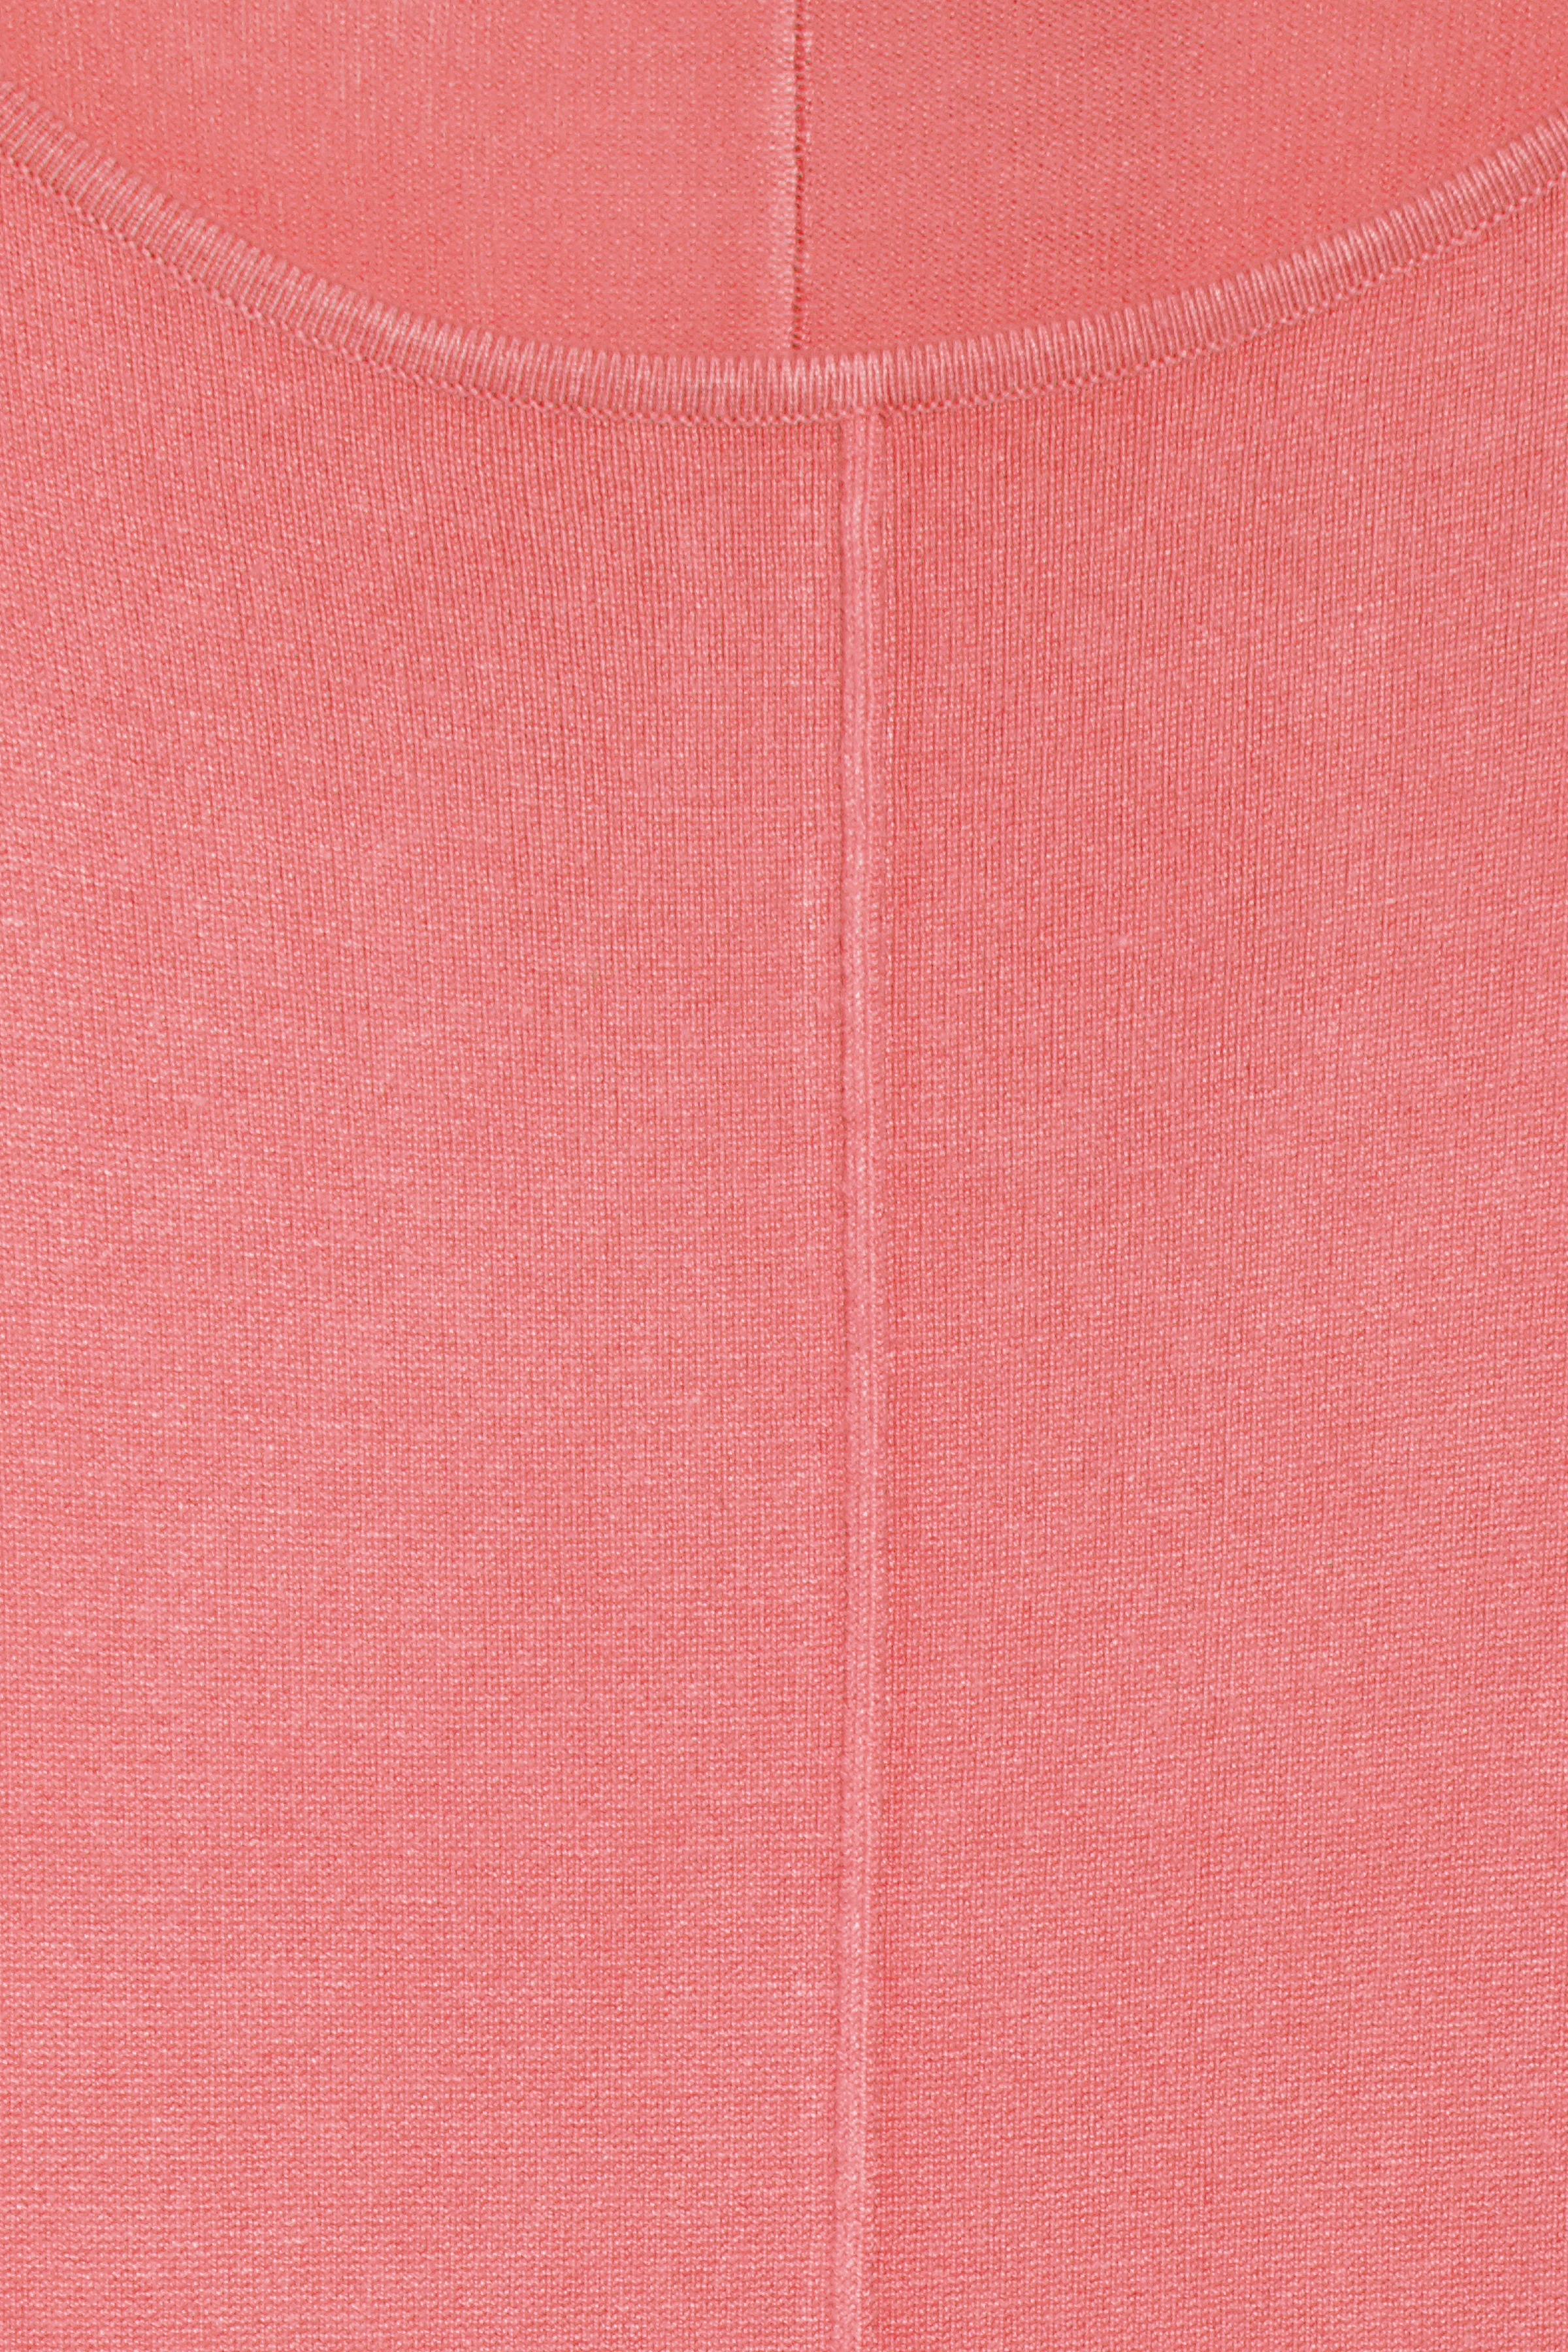 MEL. Sunkist Coral Pullover van b.young – Koop MEL. Sunkist Coral Pullover hier van size XS-XXL